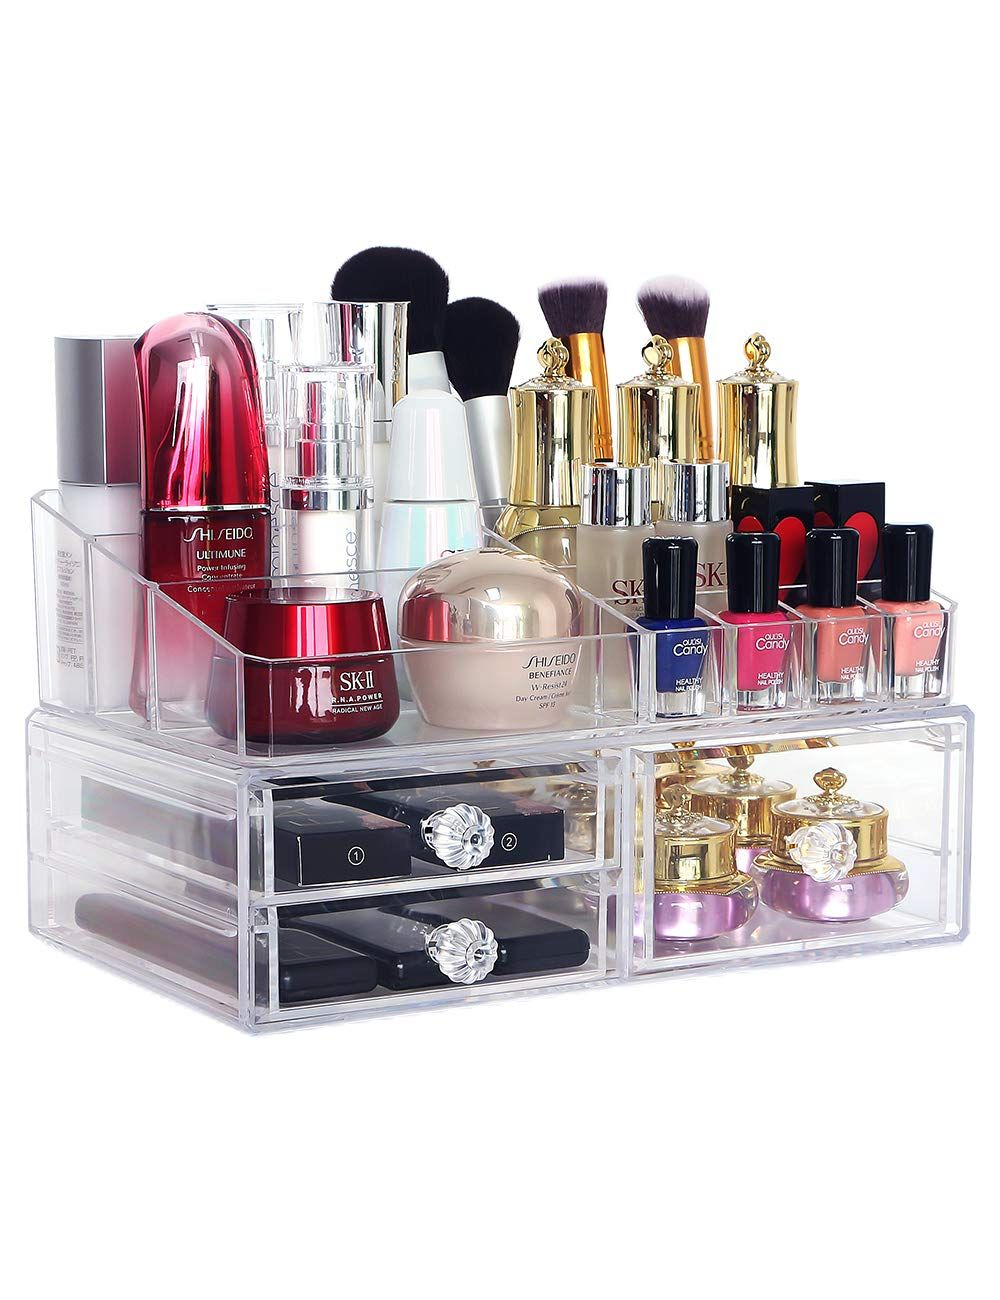 COOLBEAR Makeup Organizer Countertop Clear Acrylic